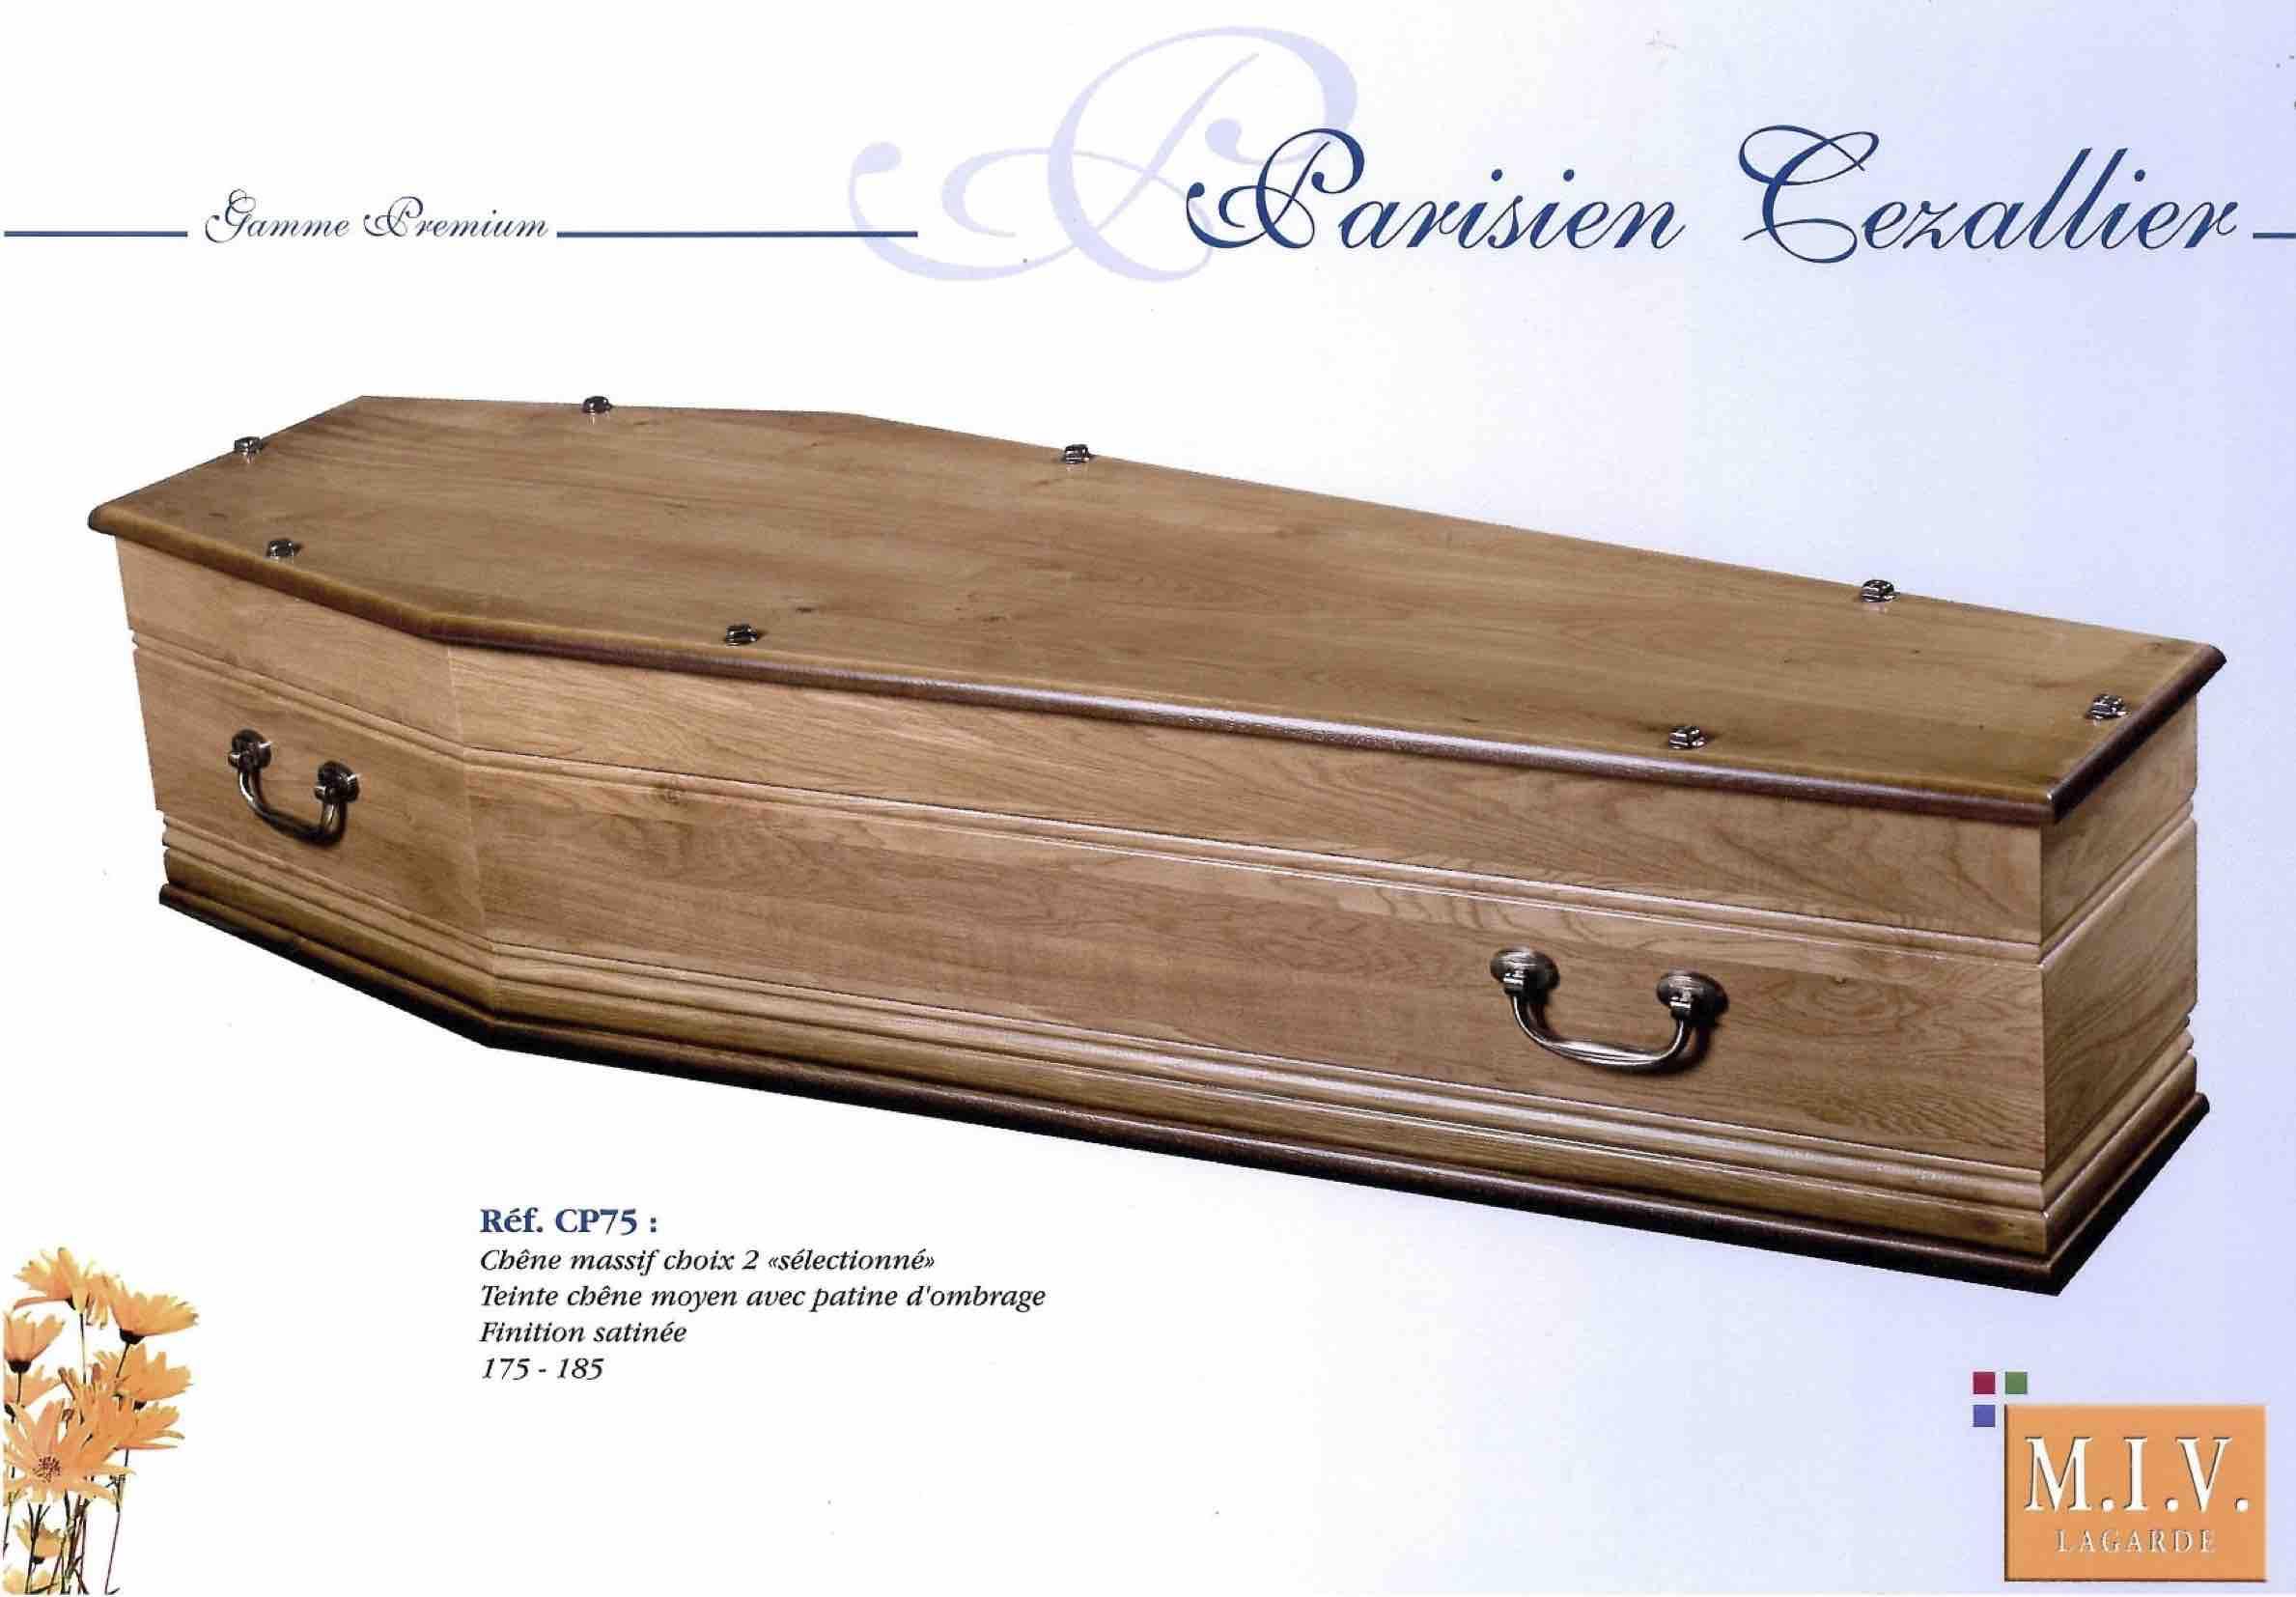 cercueil-inhumation-cezallier